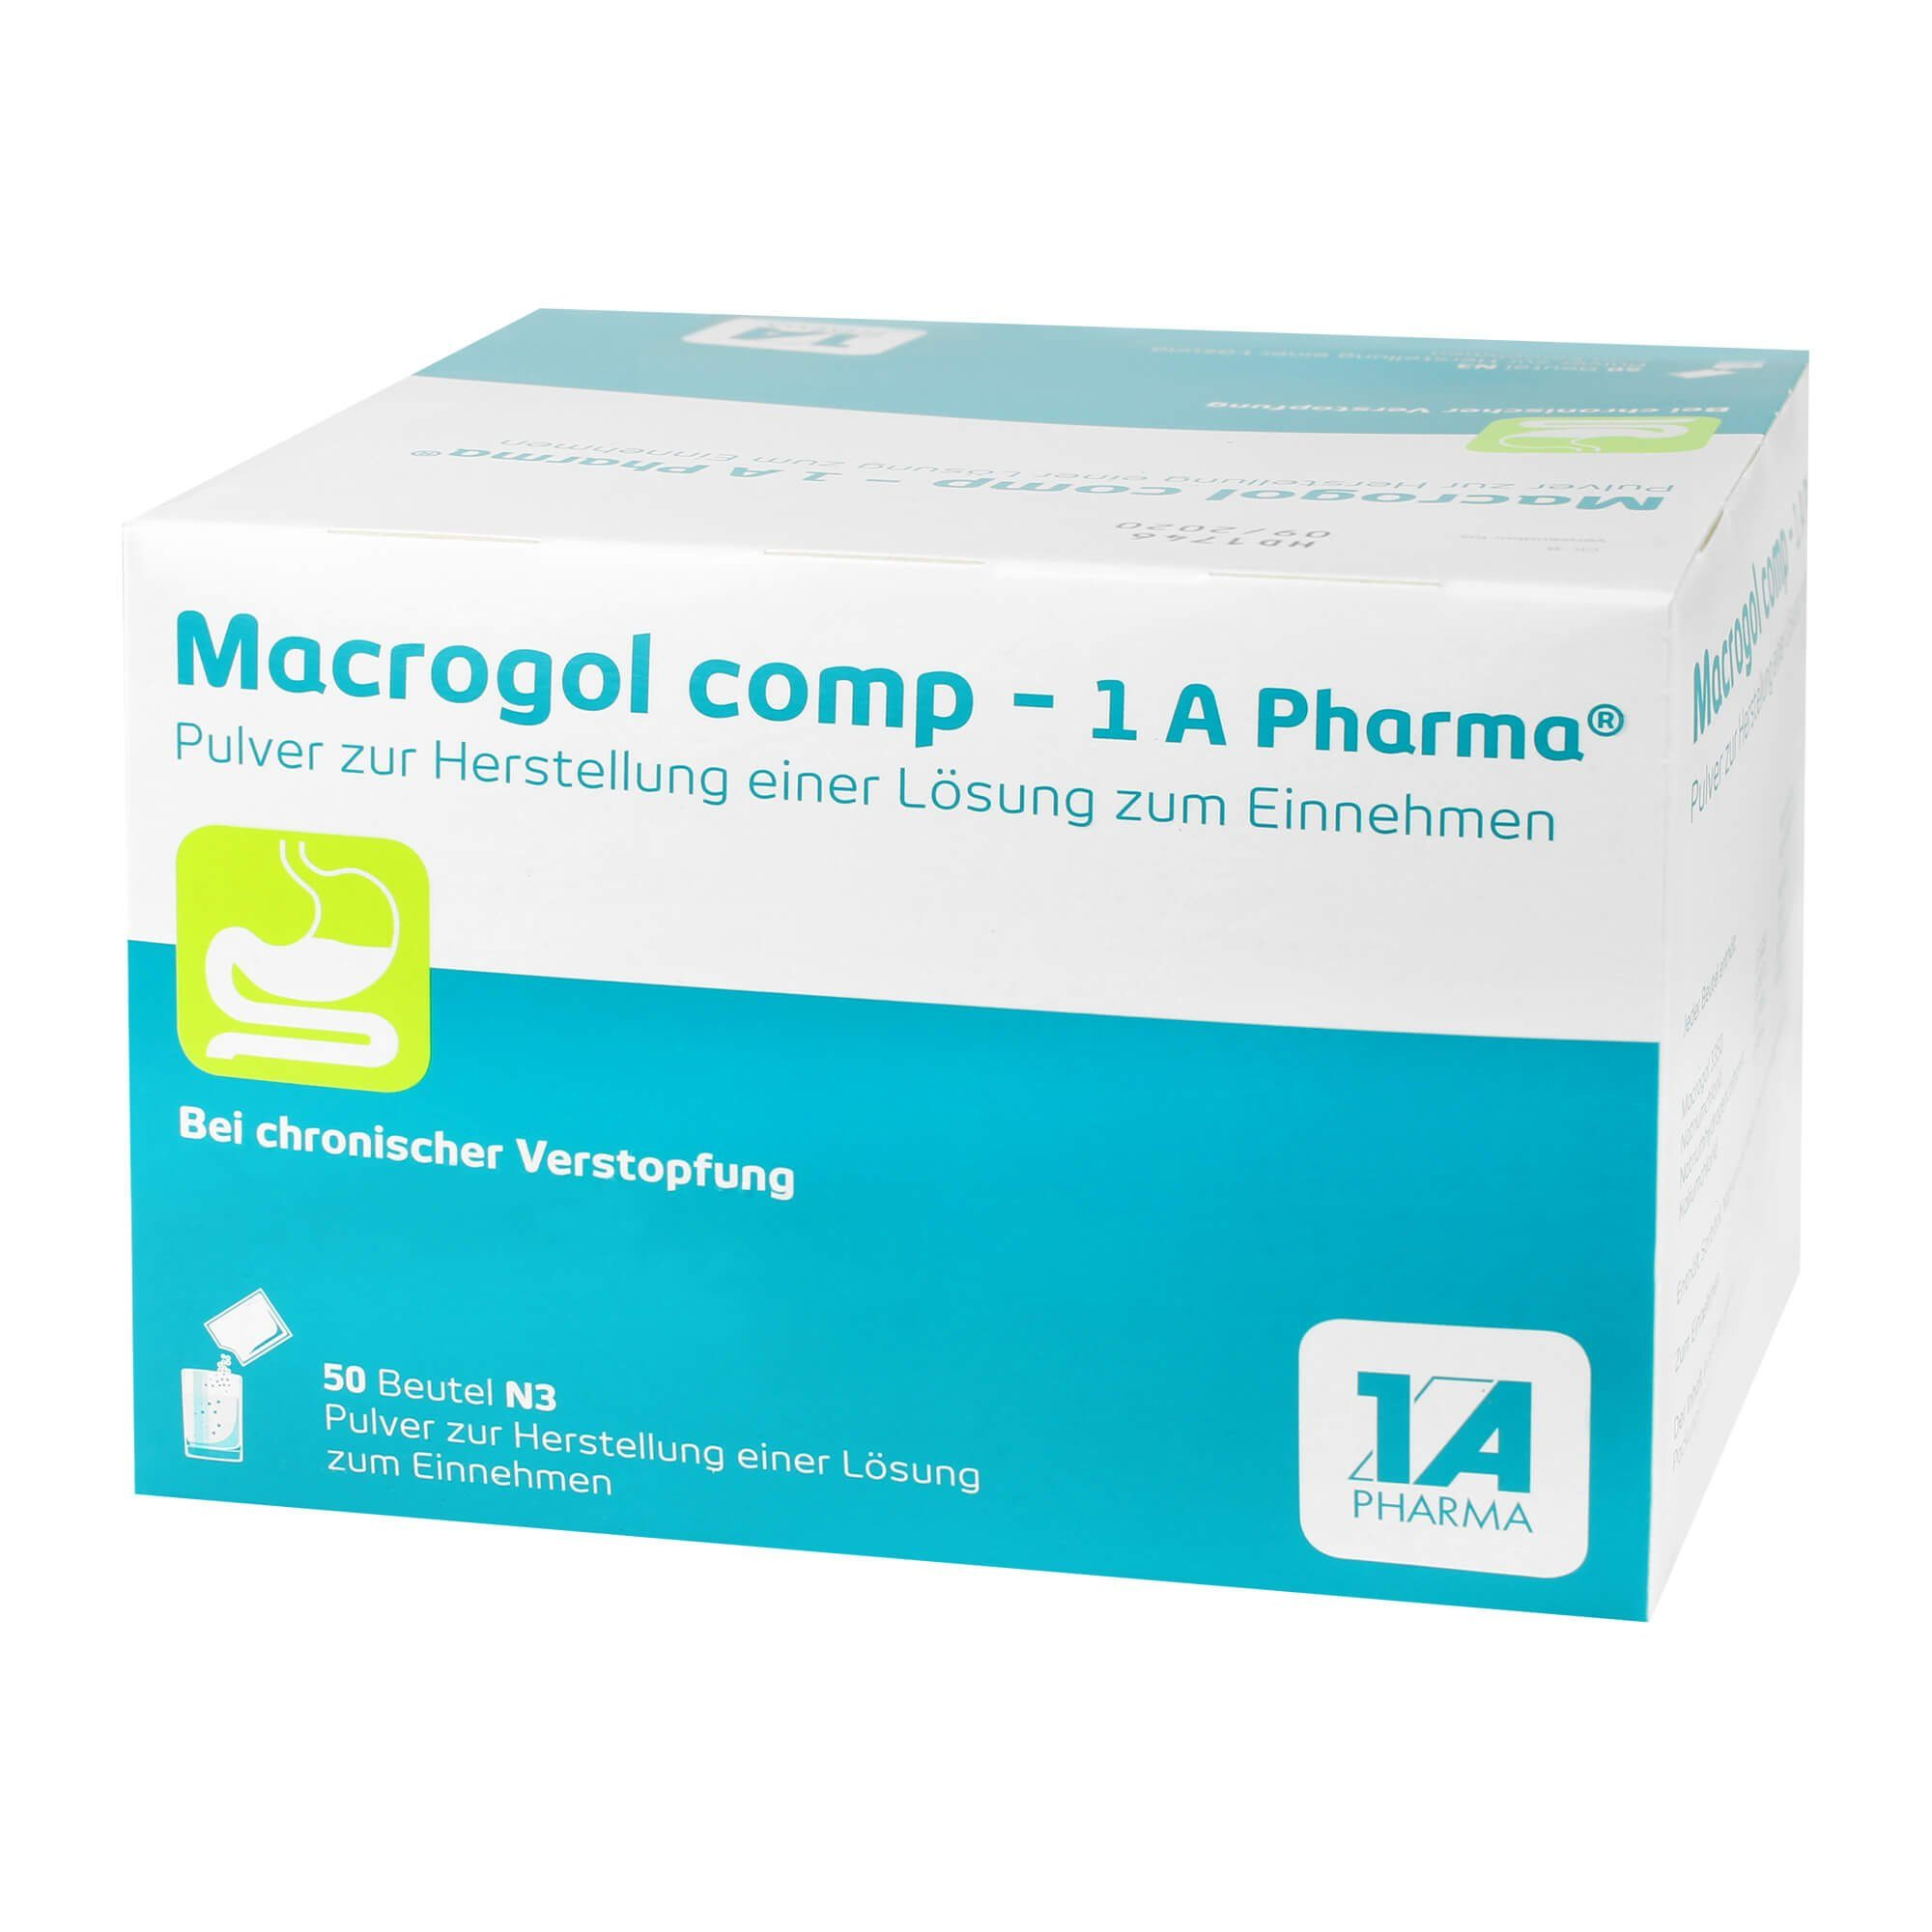 Macrogol Comp 1A Pharma Pulver, 50 St